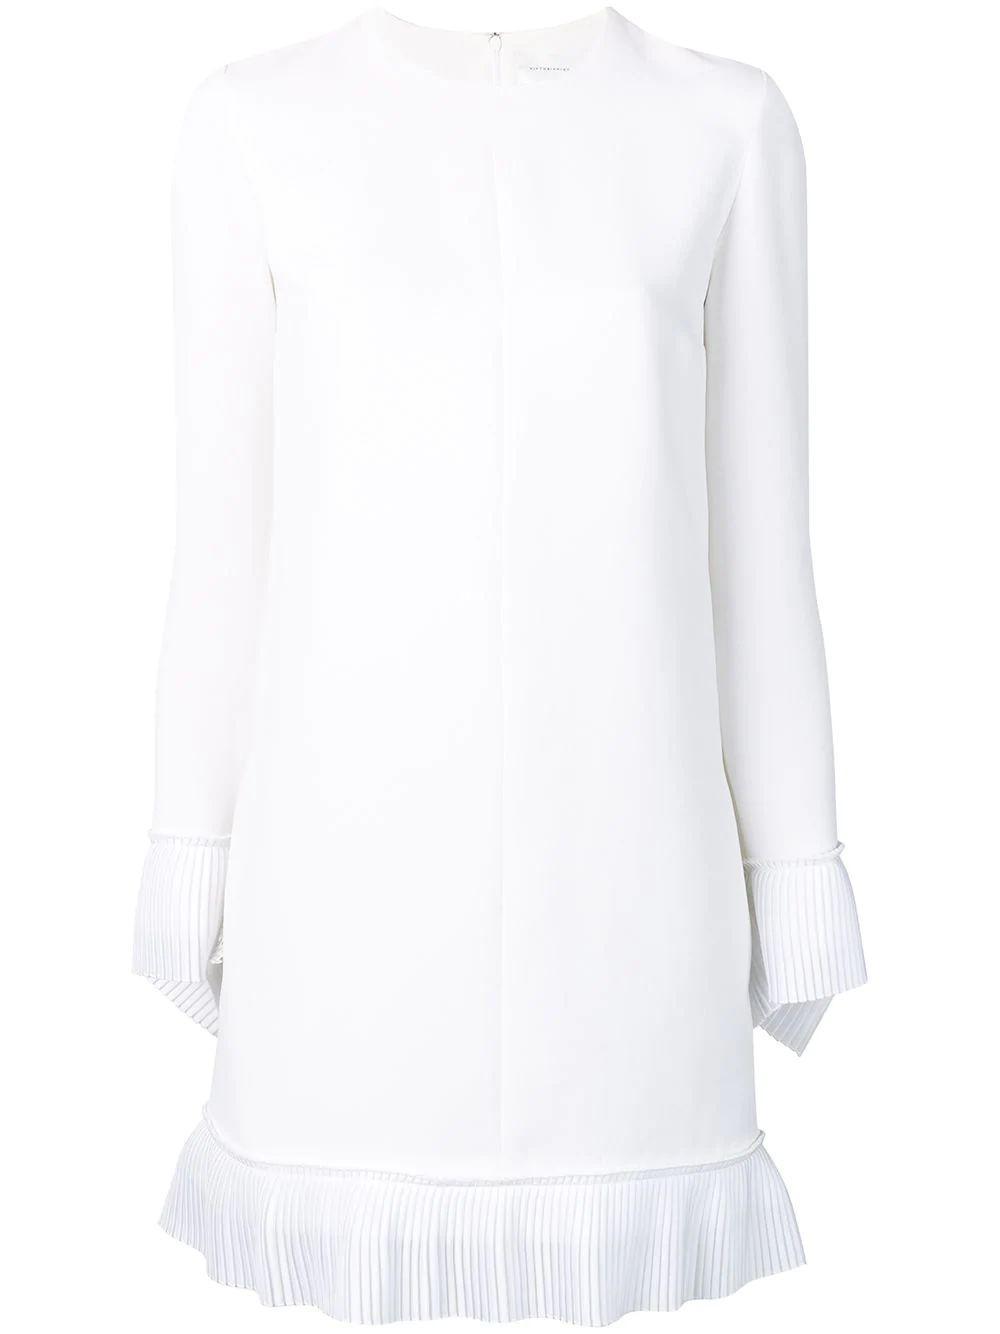 Long Sleeve Crepe Shift Dress With Pleated- Hem Collar Item # DRVV680-PAW19